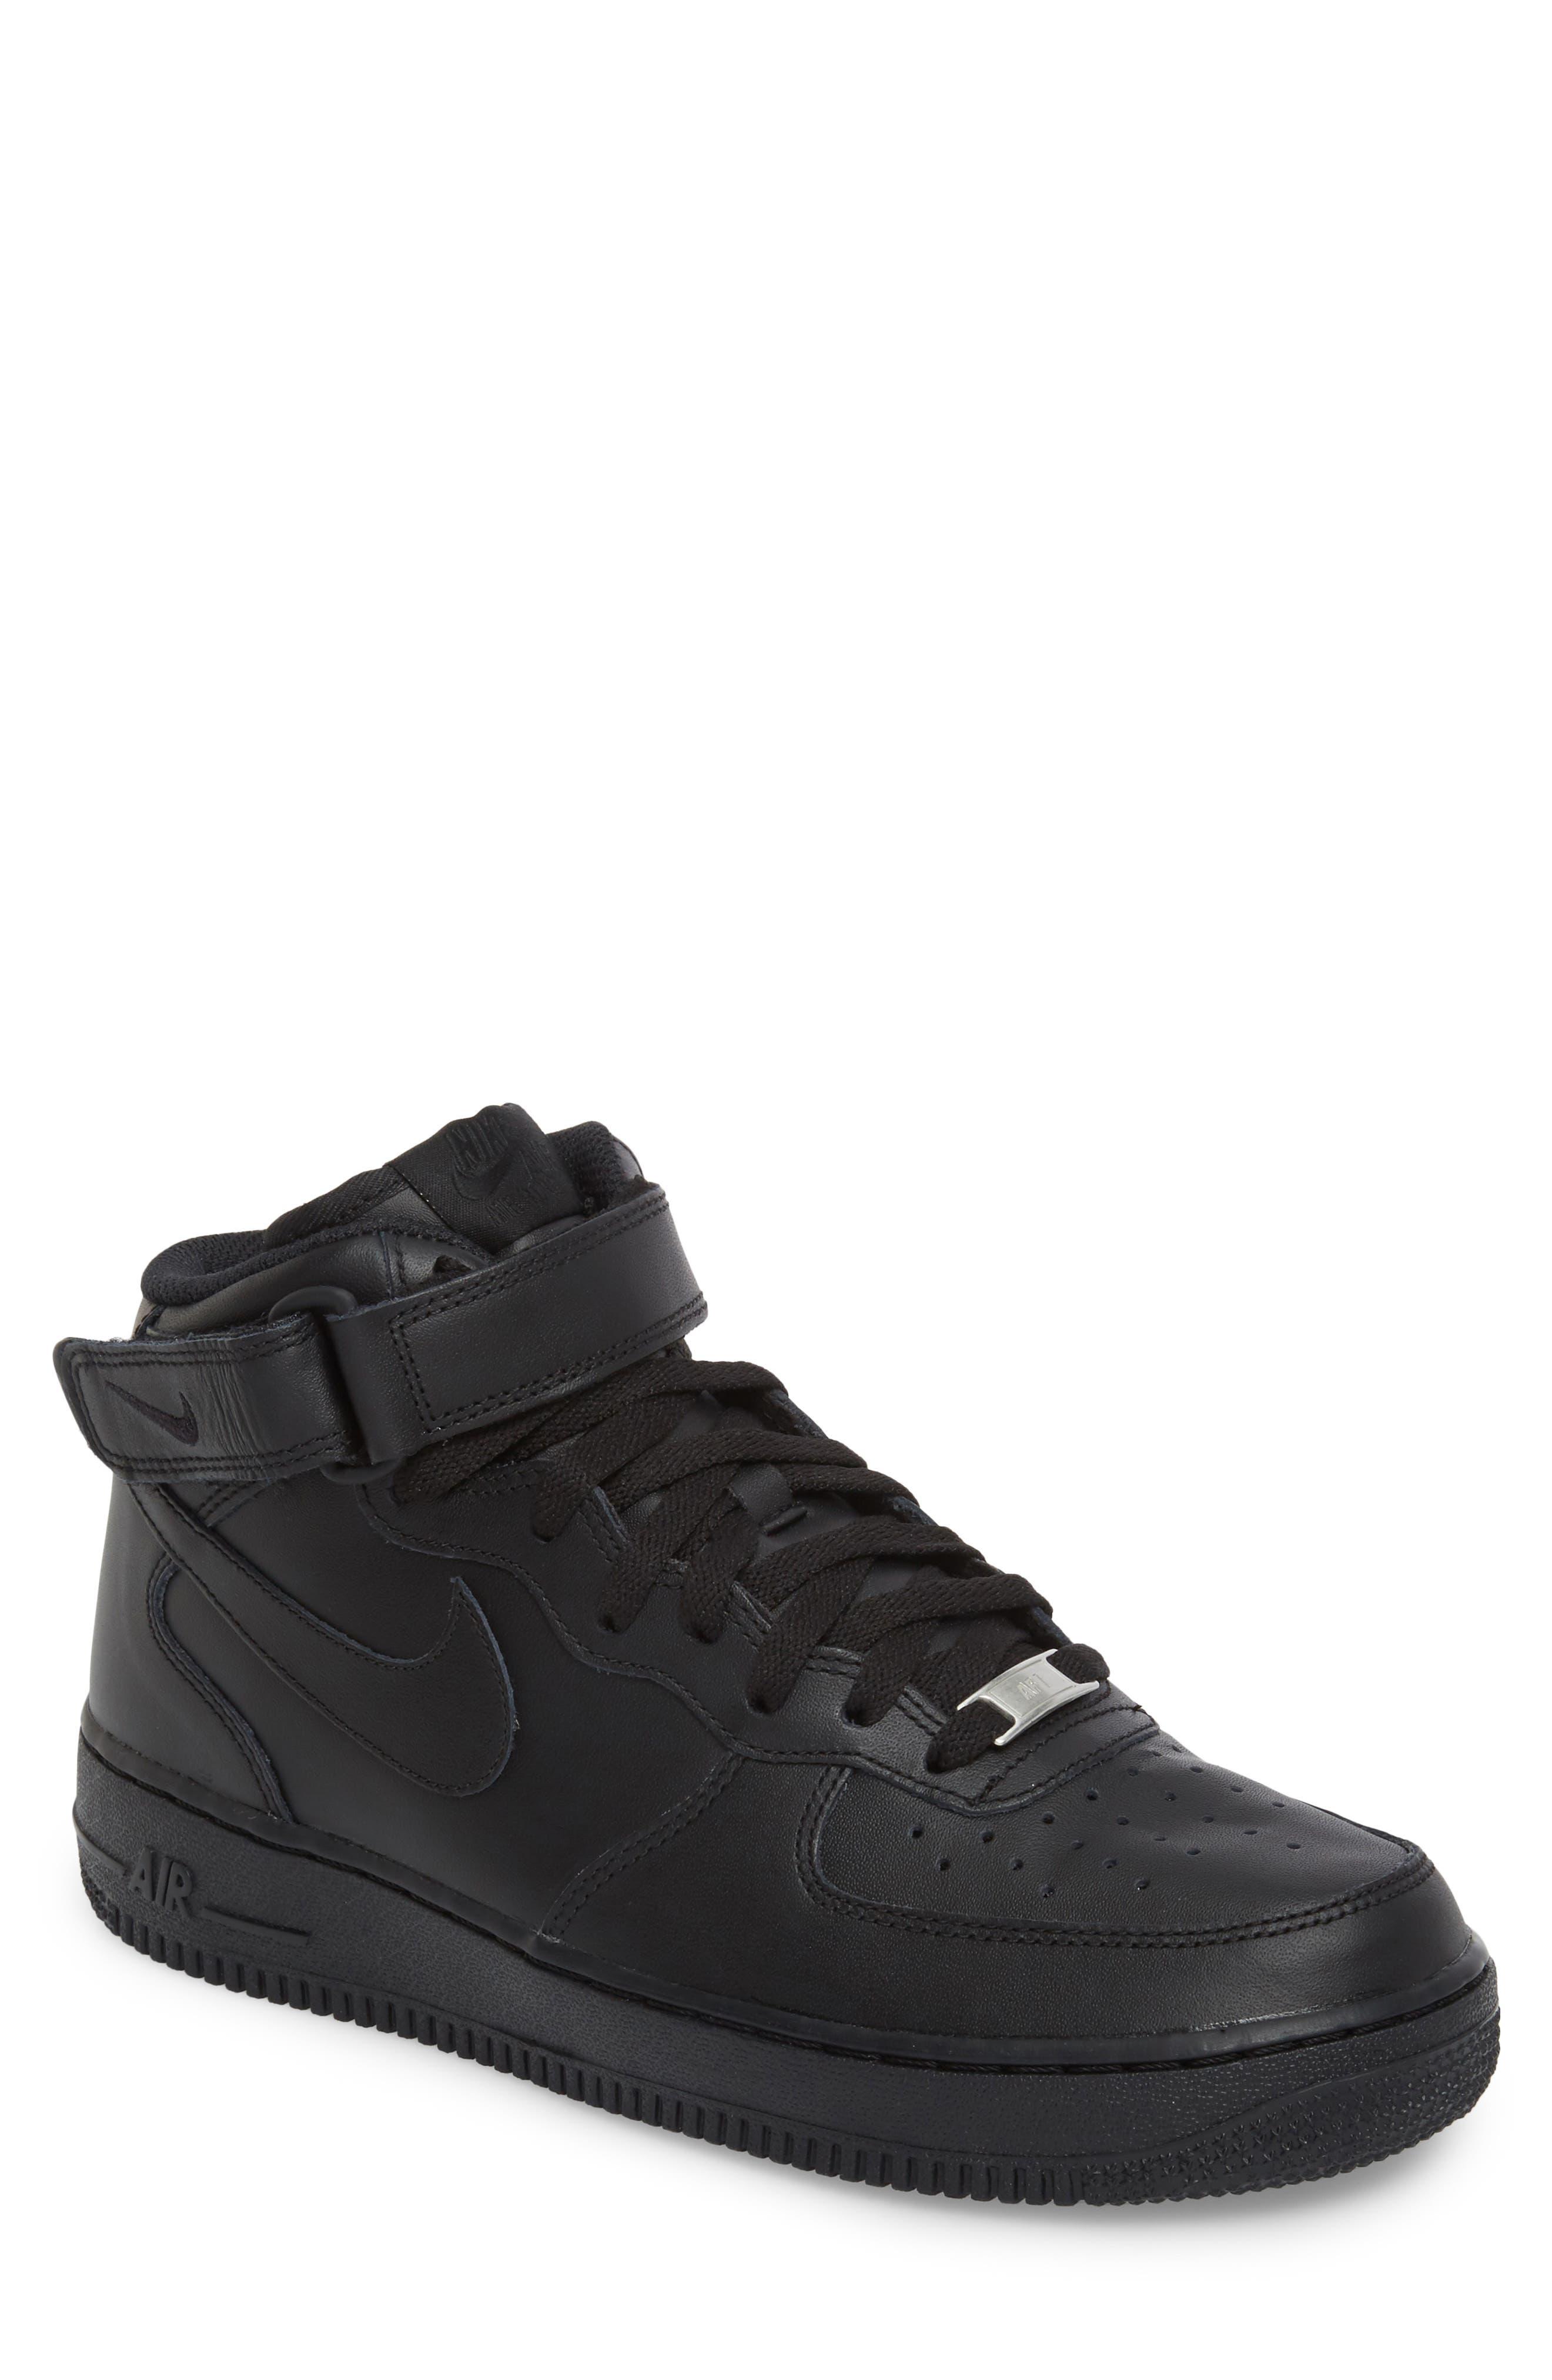 NIKE Air Force 1 Mid '07 Sneaker, Main, color, BLACK/ BLACK